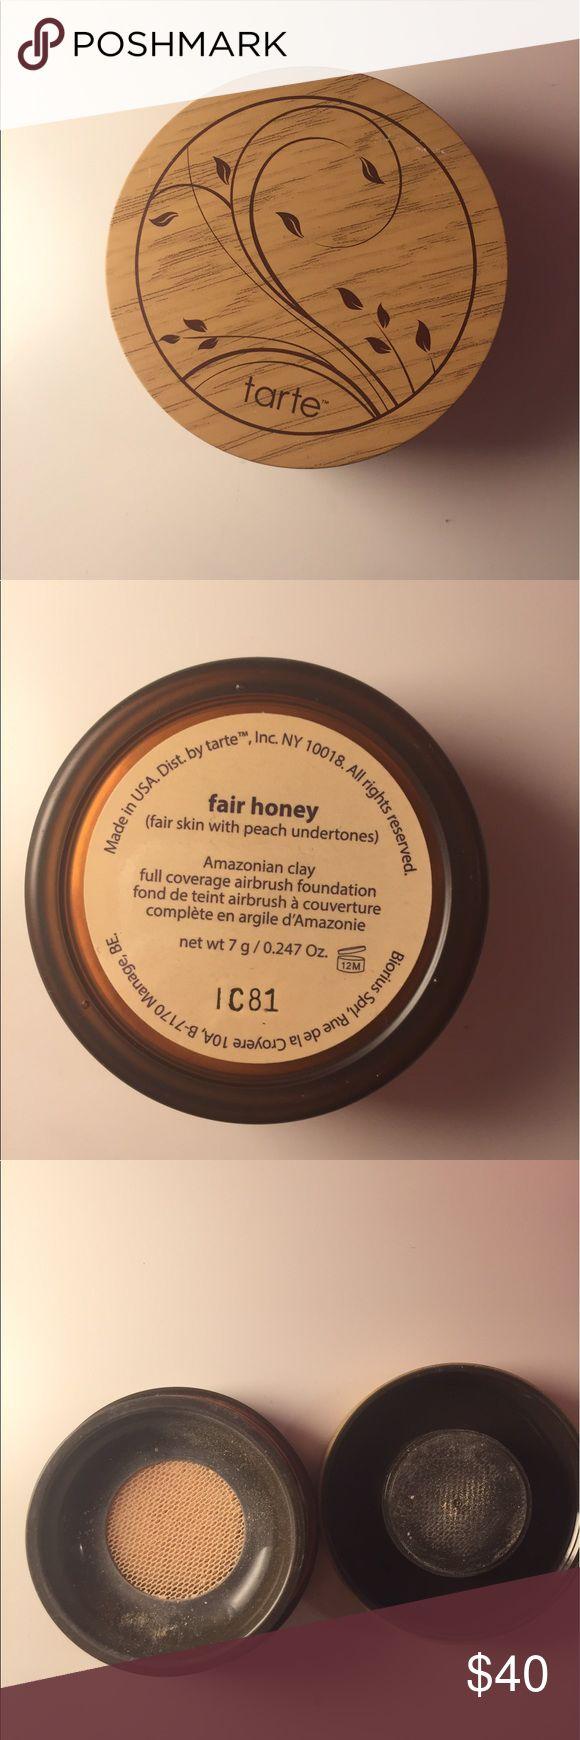 Tarte Amazonian Clay Airbrush Foundation In shade fair honey. barely used tarte Makeup Foundation